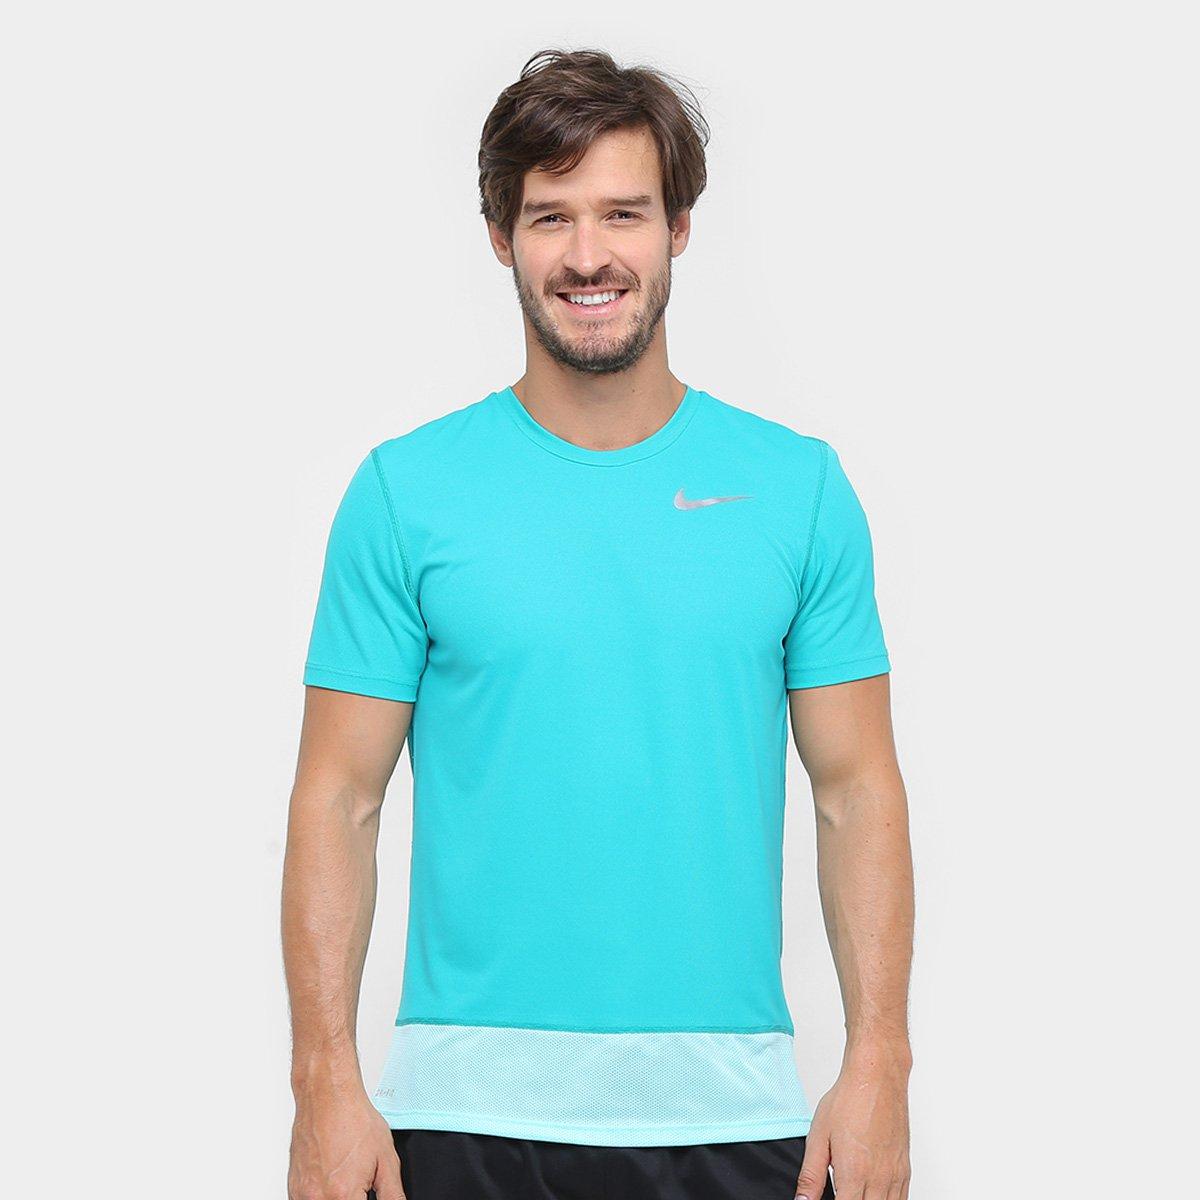 ba2dd8e2201c3 Camiseta Nike Dri-Fit Breathe Rapid SS Masculina - Compre Agora ...